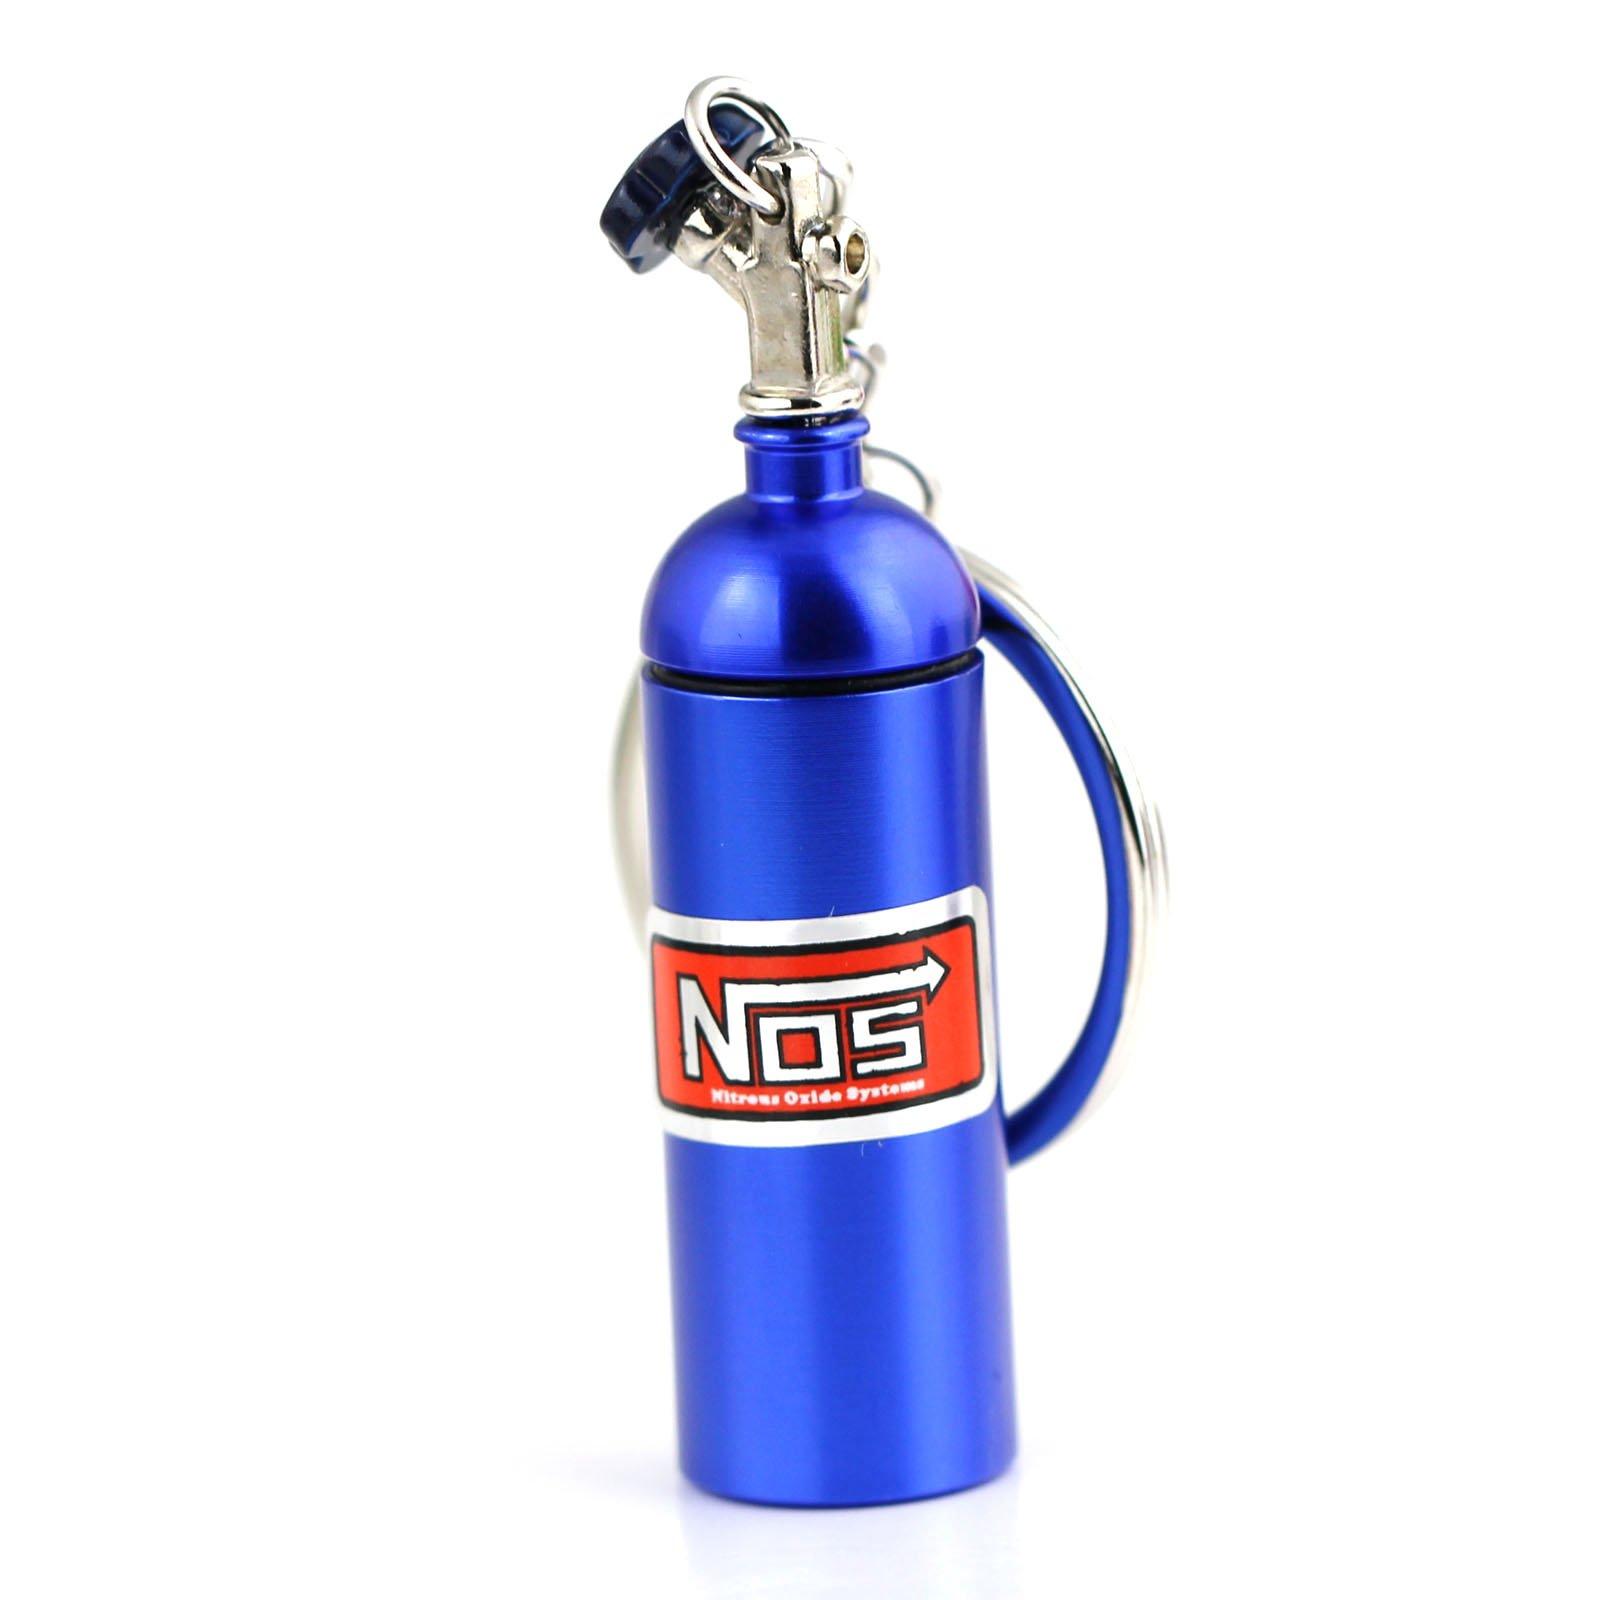 NOS Bottle Tank Nitrous Oxide Keyring Keyfob Keychain Metal Turbo Mini Pill Blue